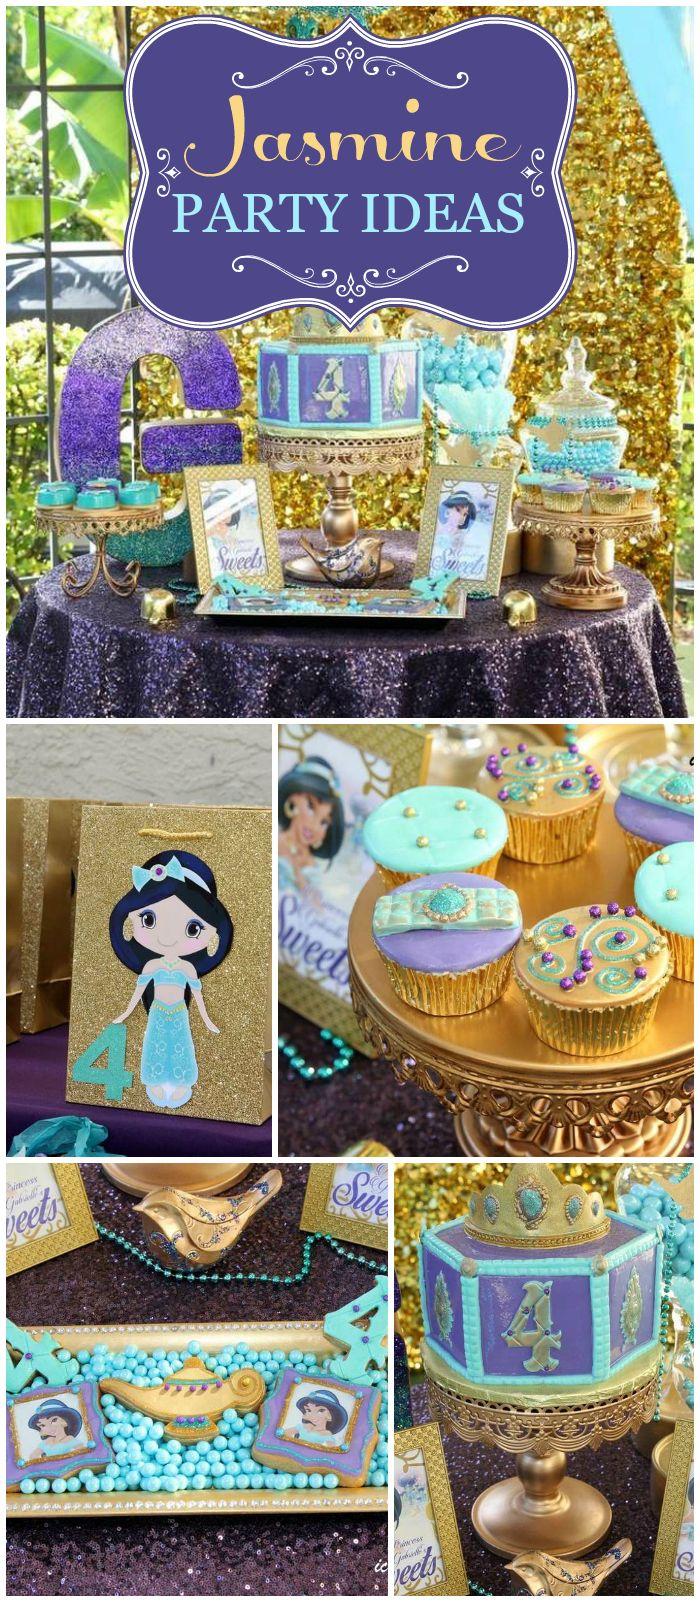 *Aladdin Party